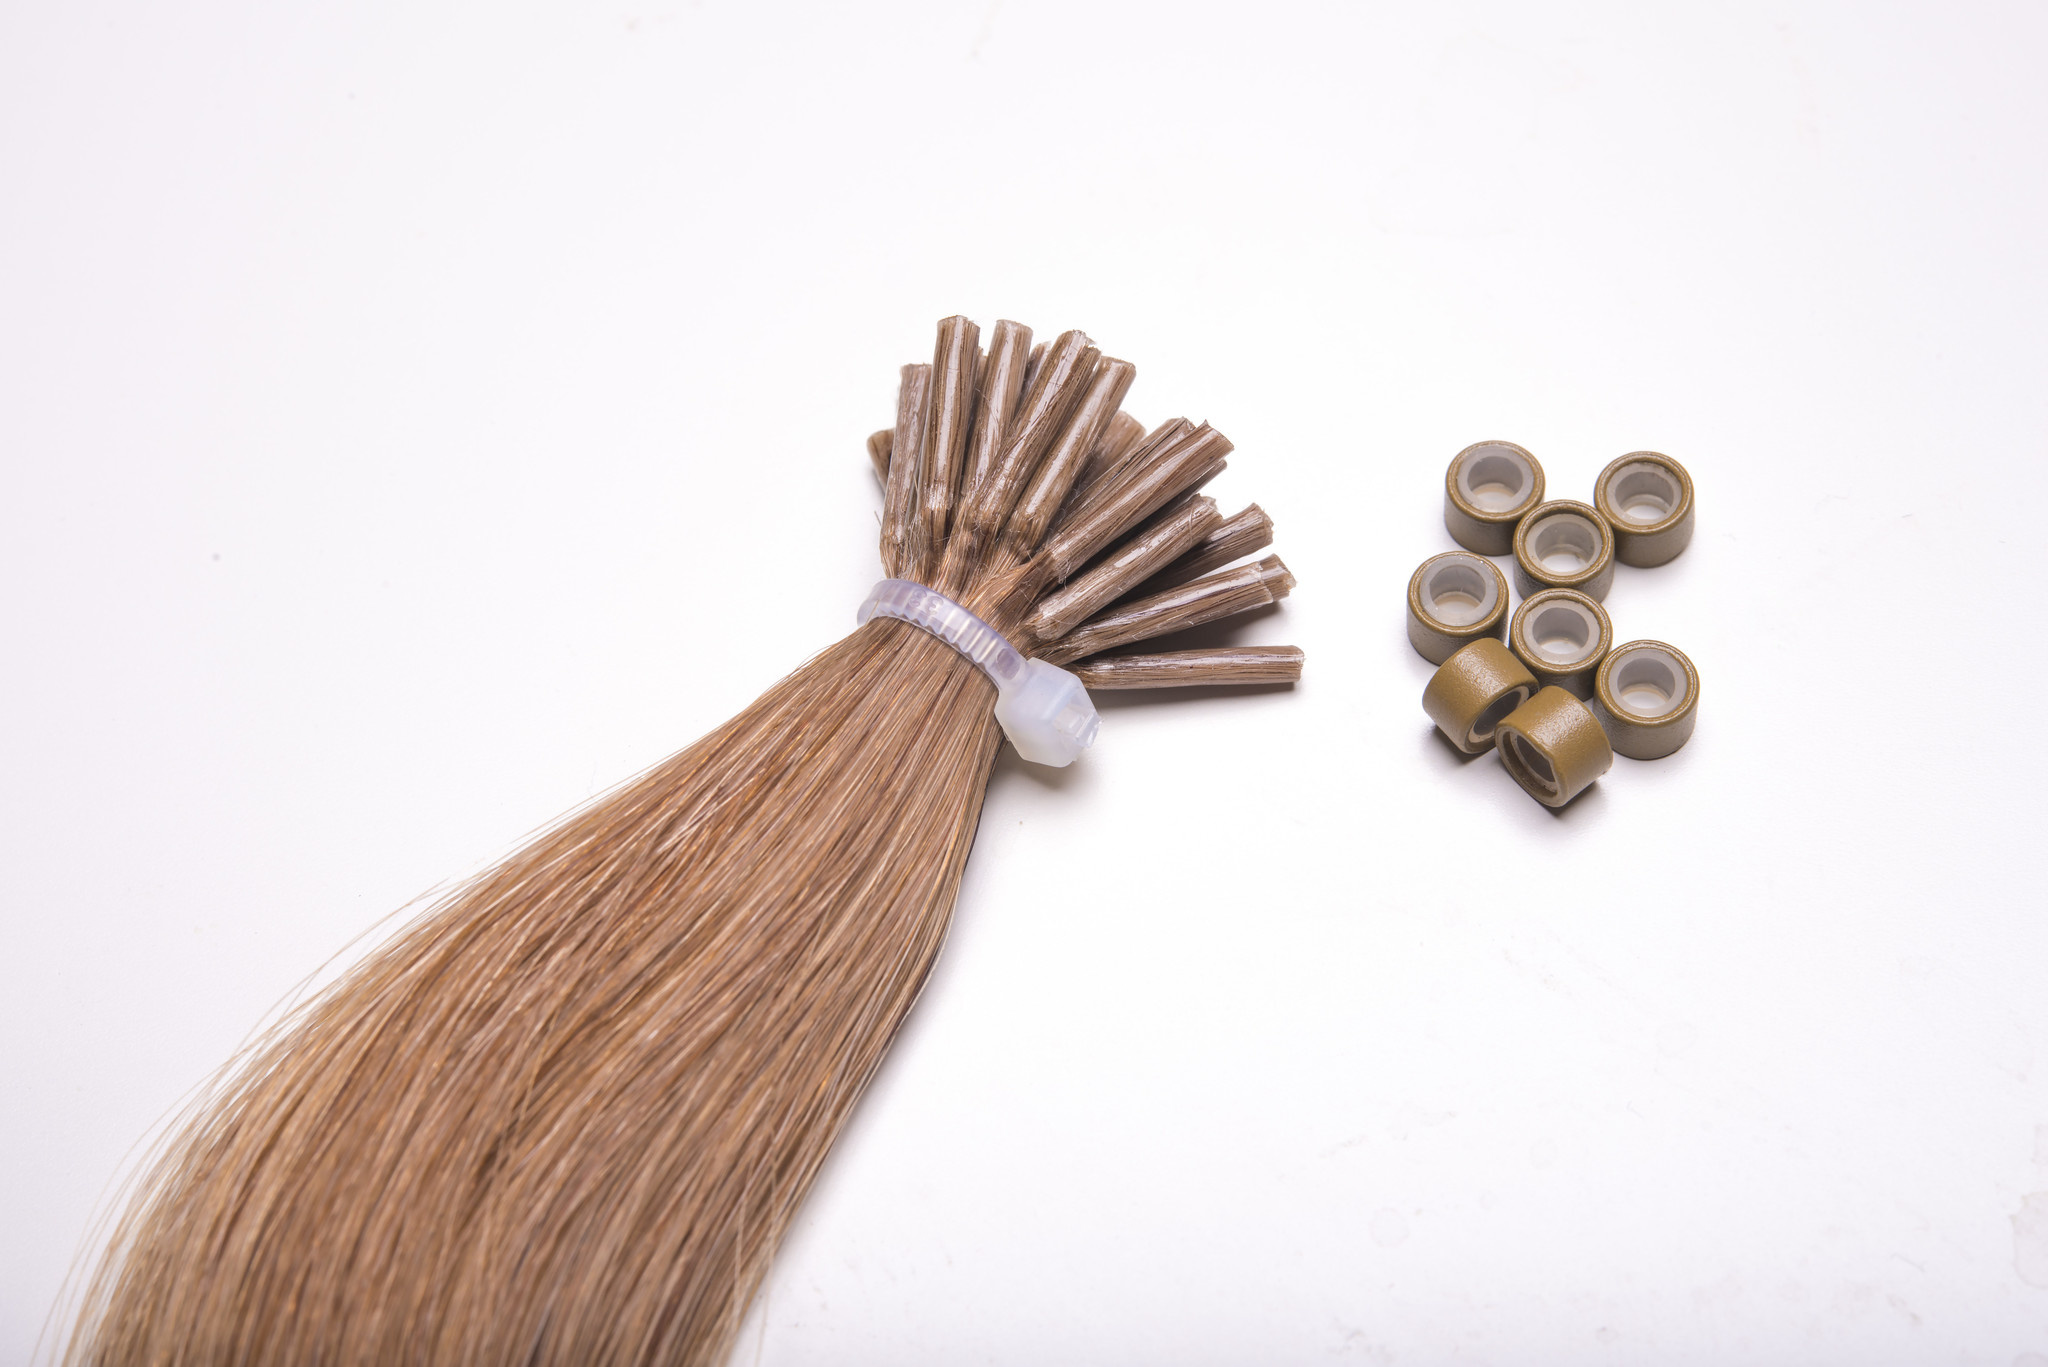 SilverFox Microring Extensions - Steil -  #60 White Blonde